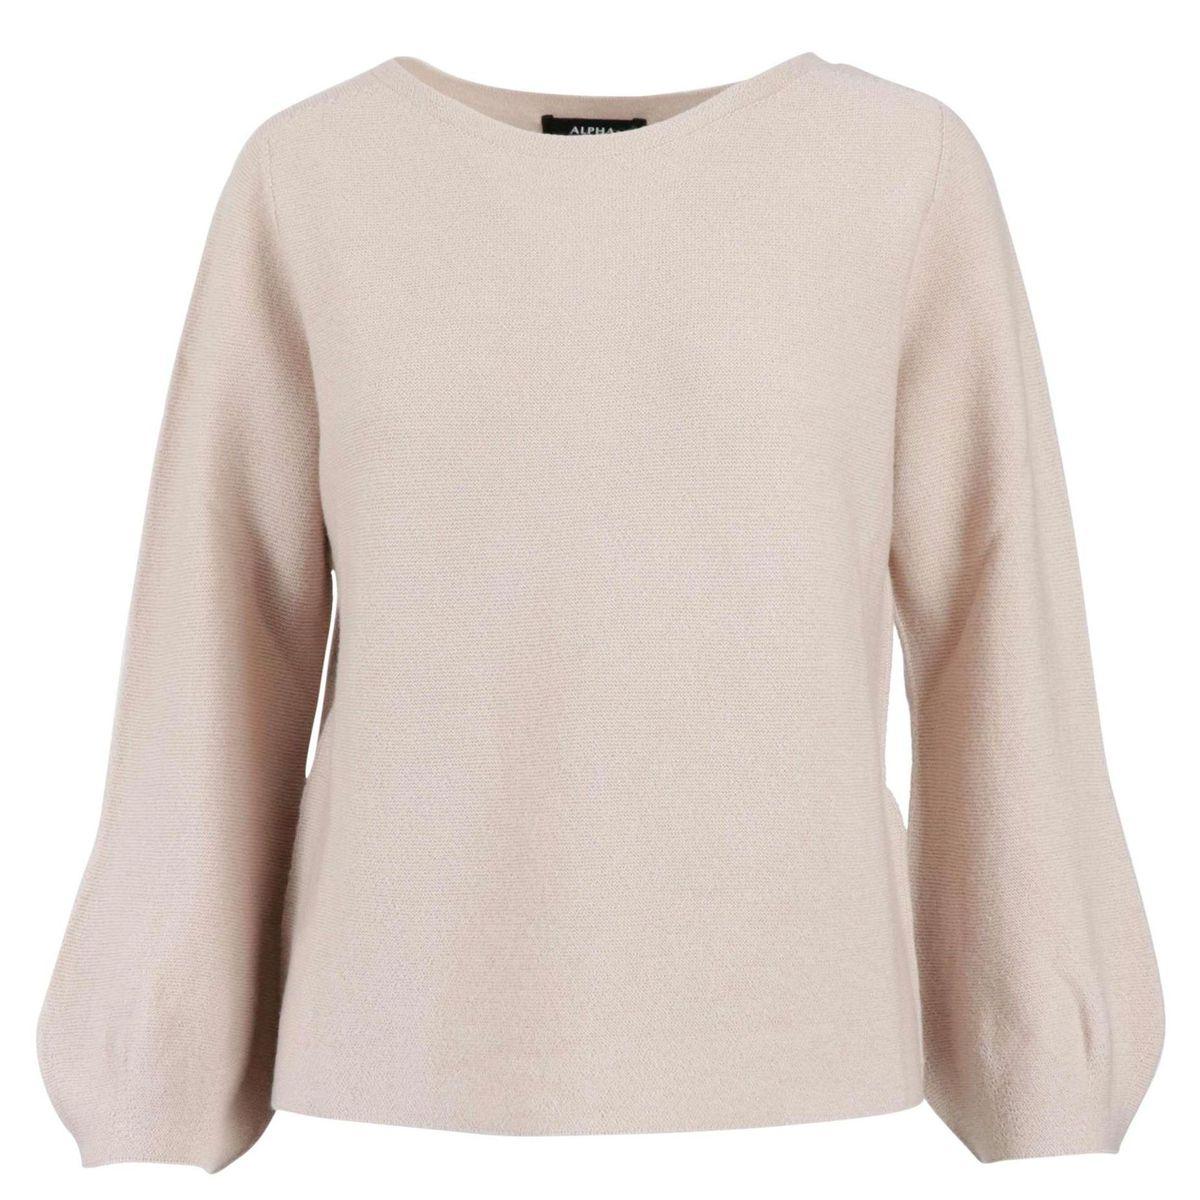 Crewneck sweater in wool with wide sleeves Quartz Alpha Studio